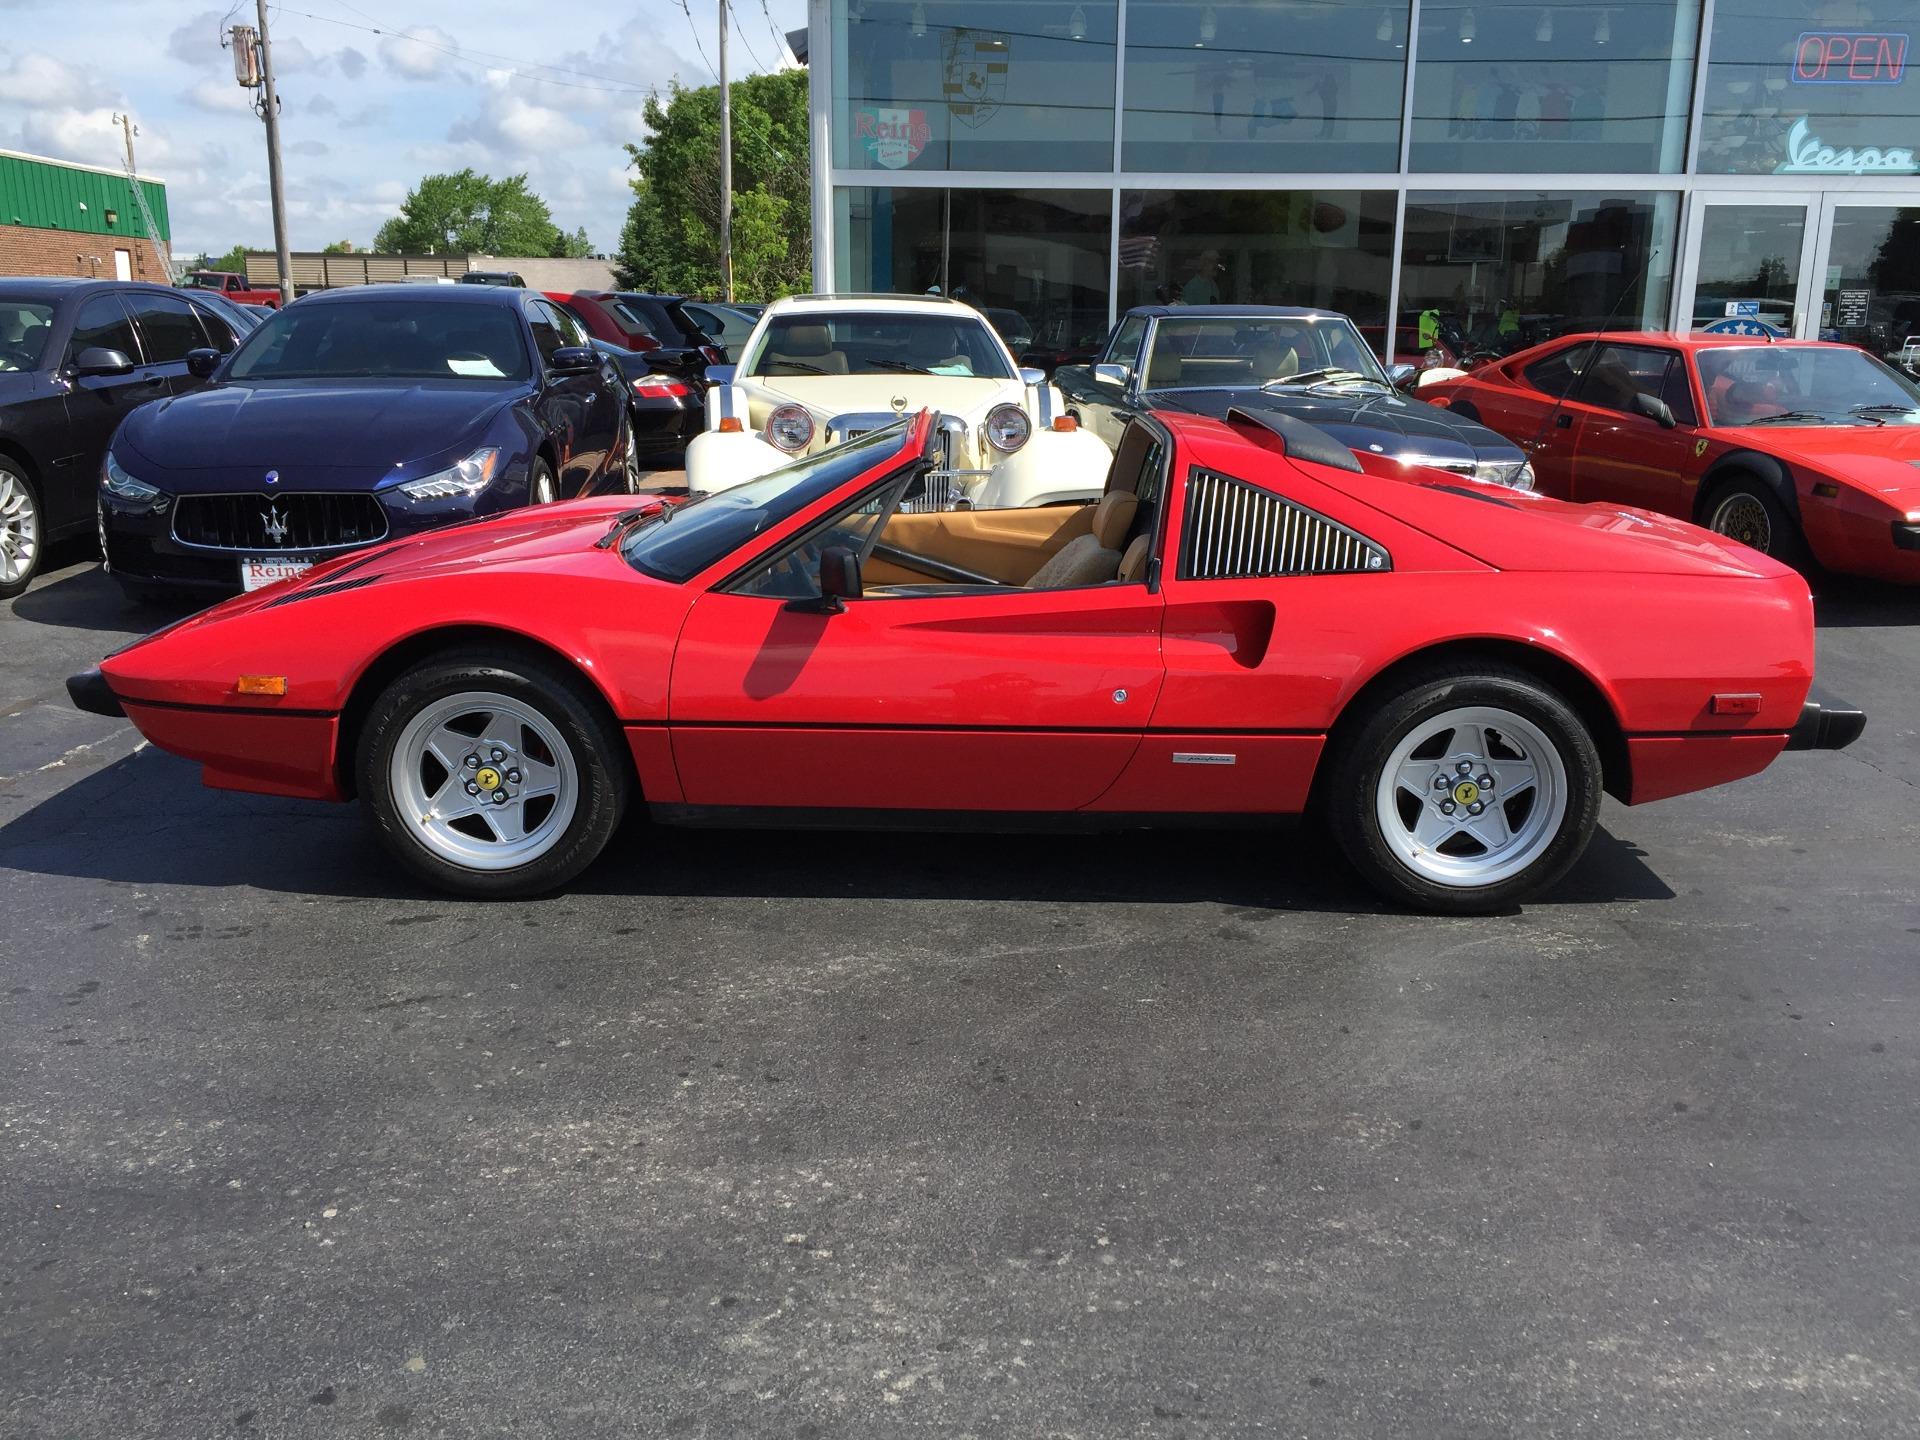 Used-1985-Ferrari-308-GTSI-Quattrovalvole